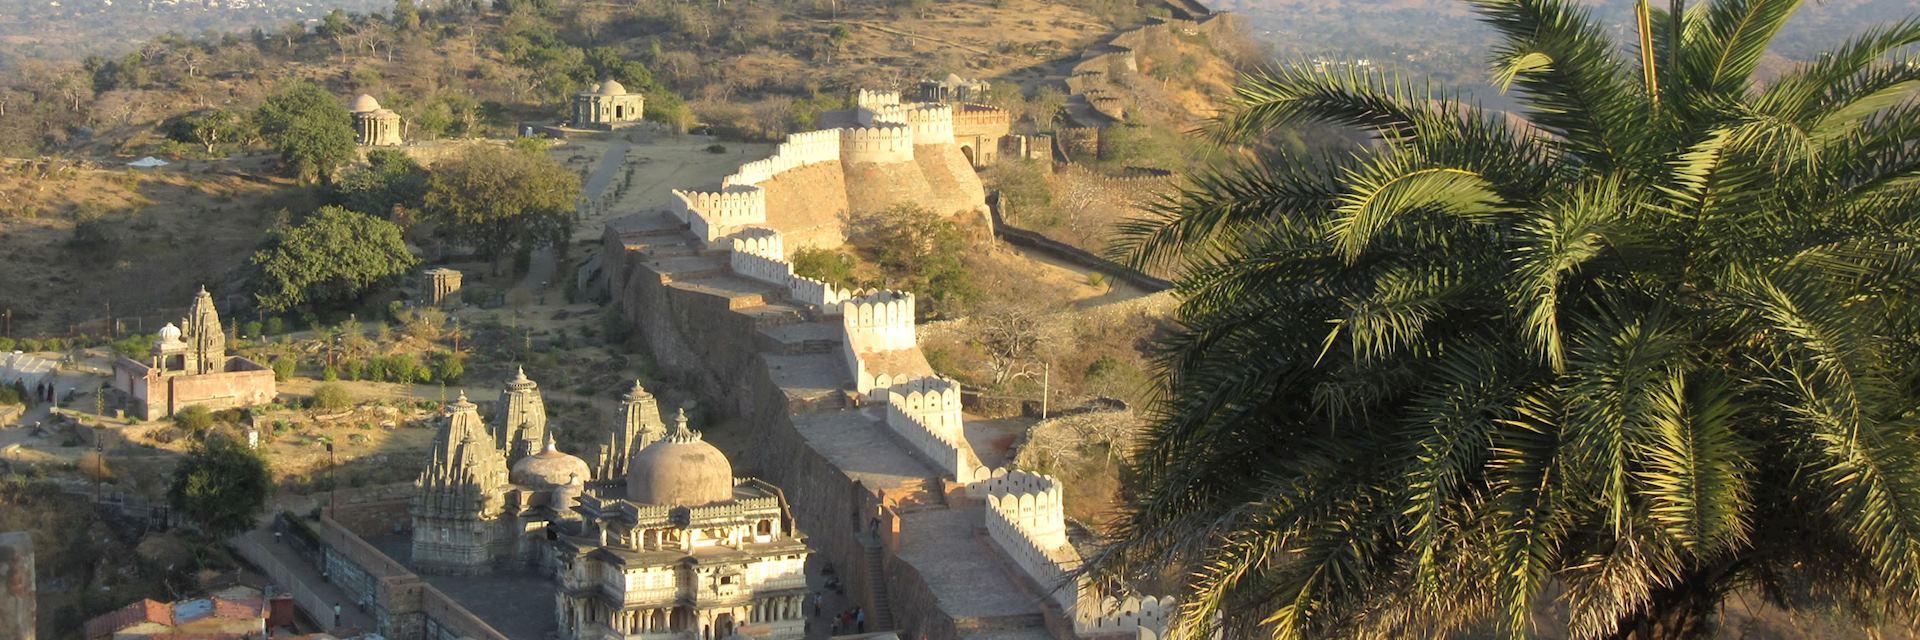 Kumbhalgarh Fortress in Chanoud, Rajasthan